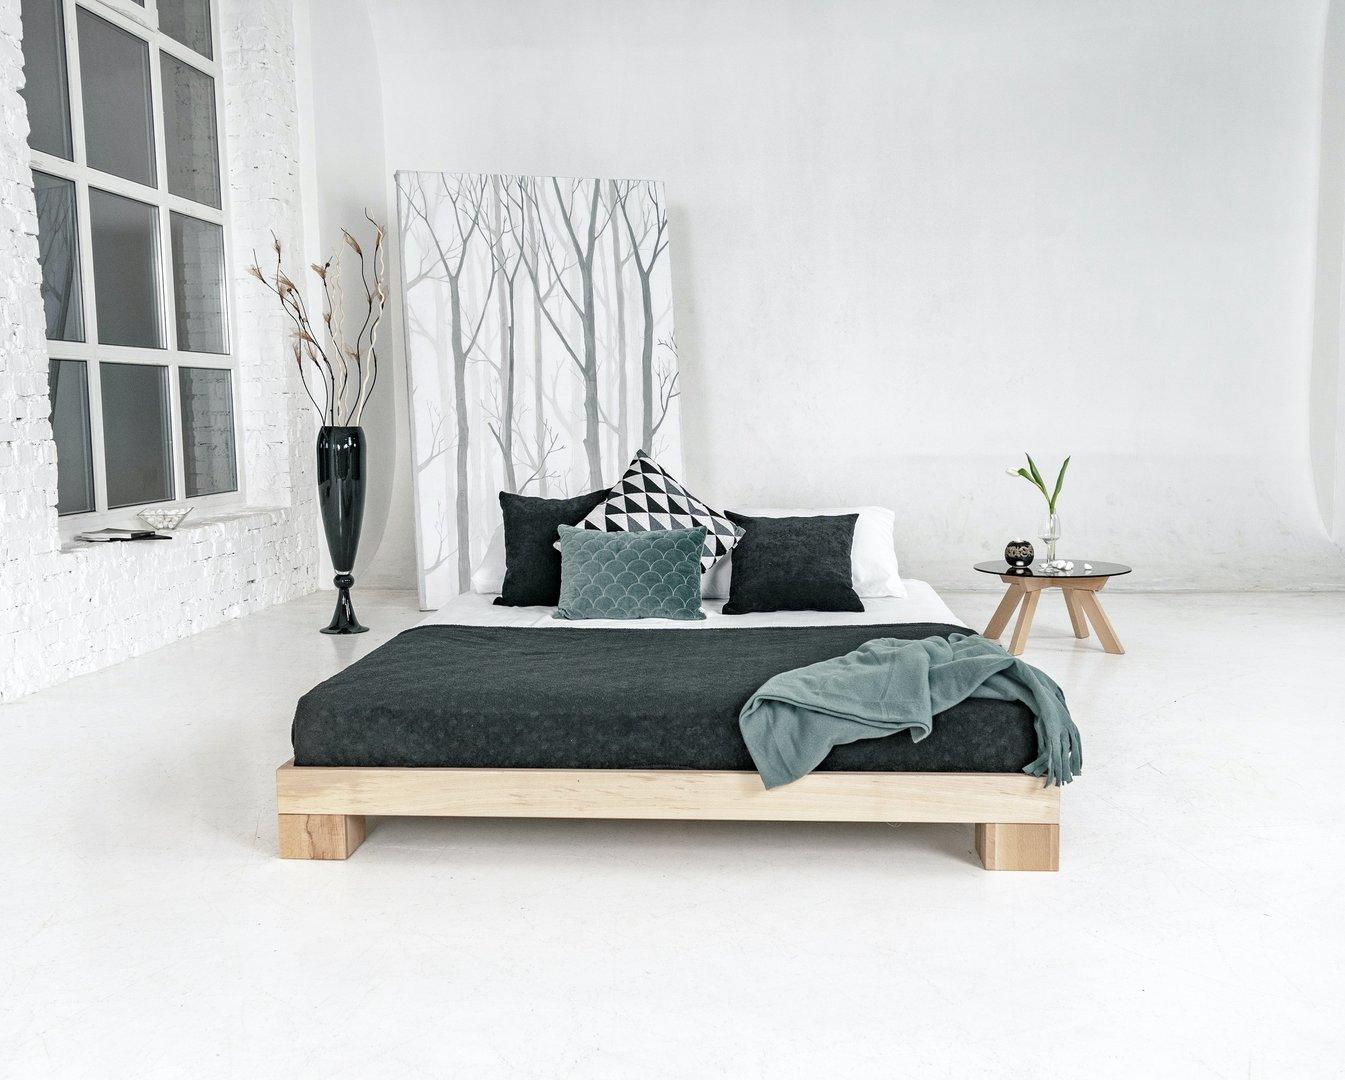 Cube bedroom bed 180x200 raw wood